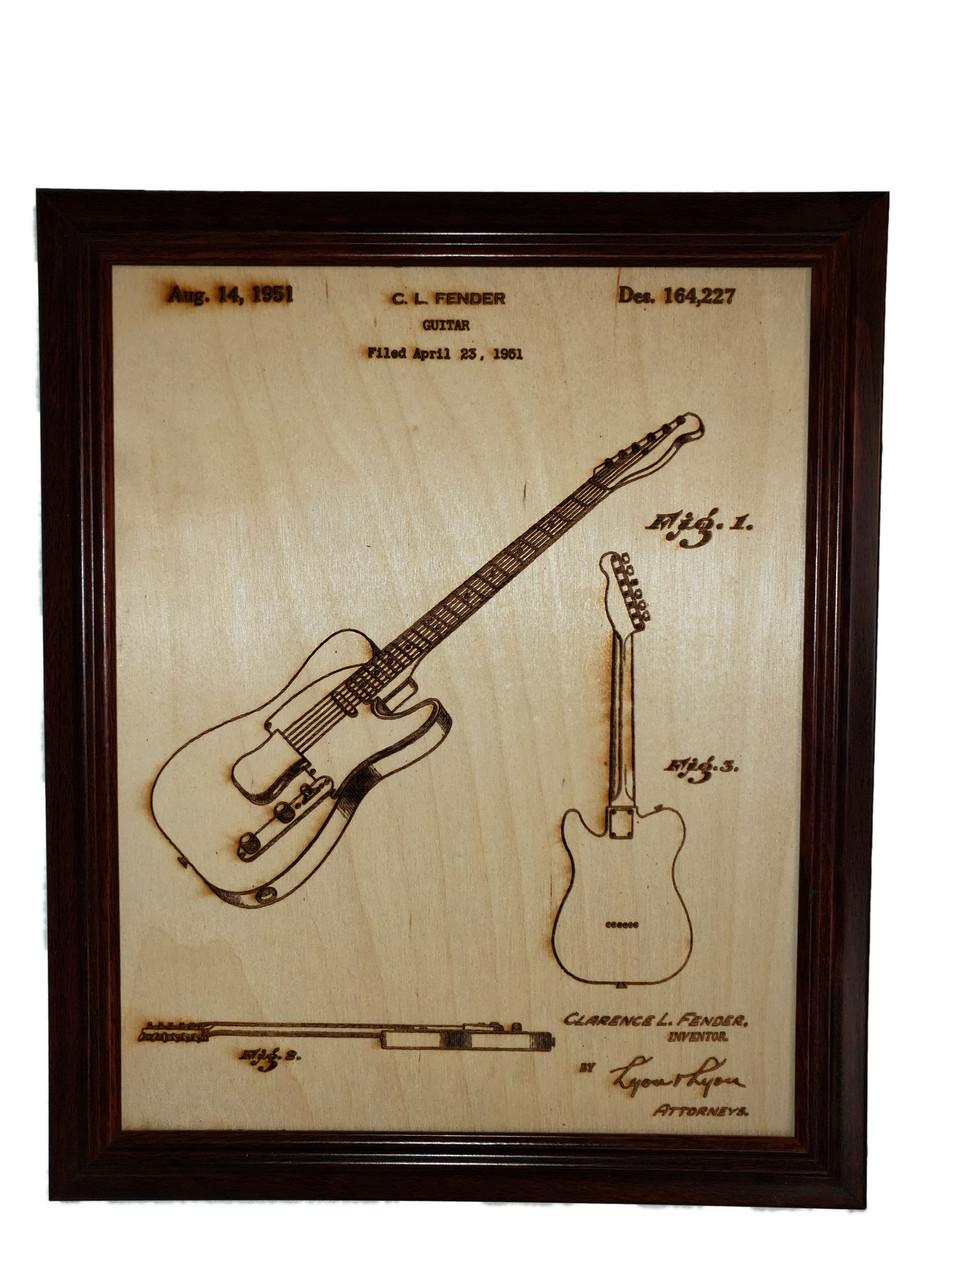 Fender Telecaster guitar patent #164,227